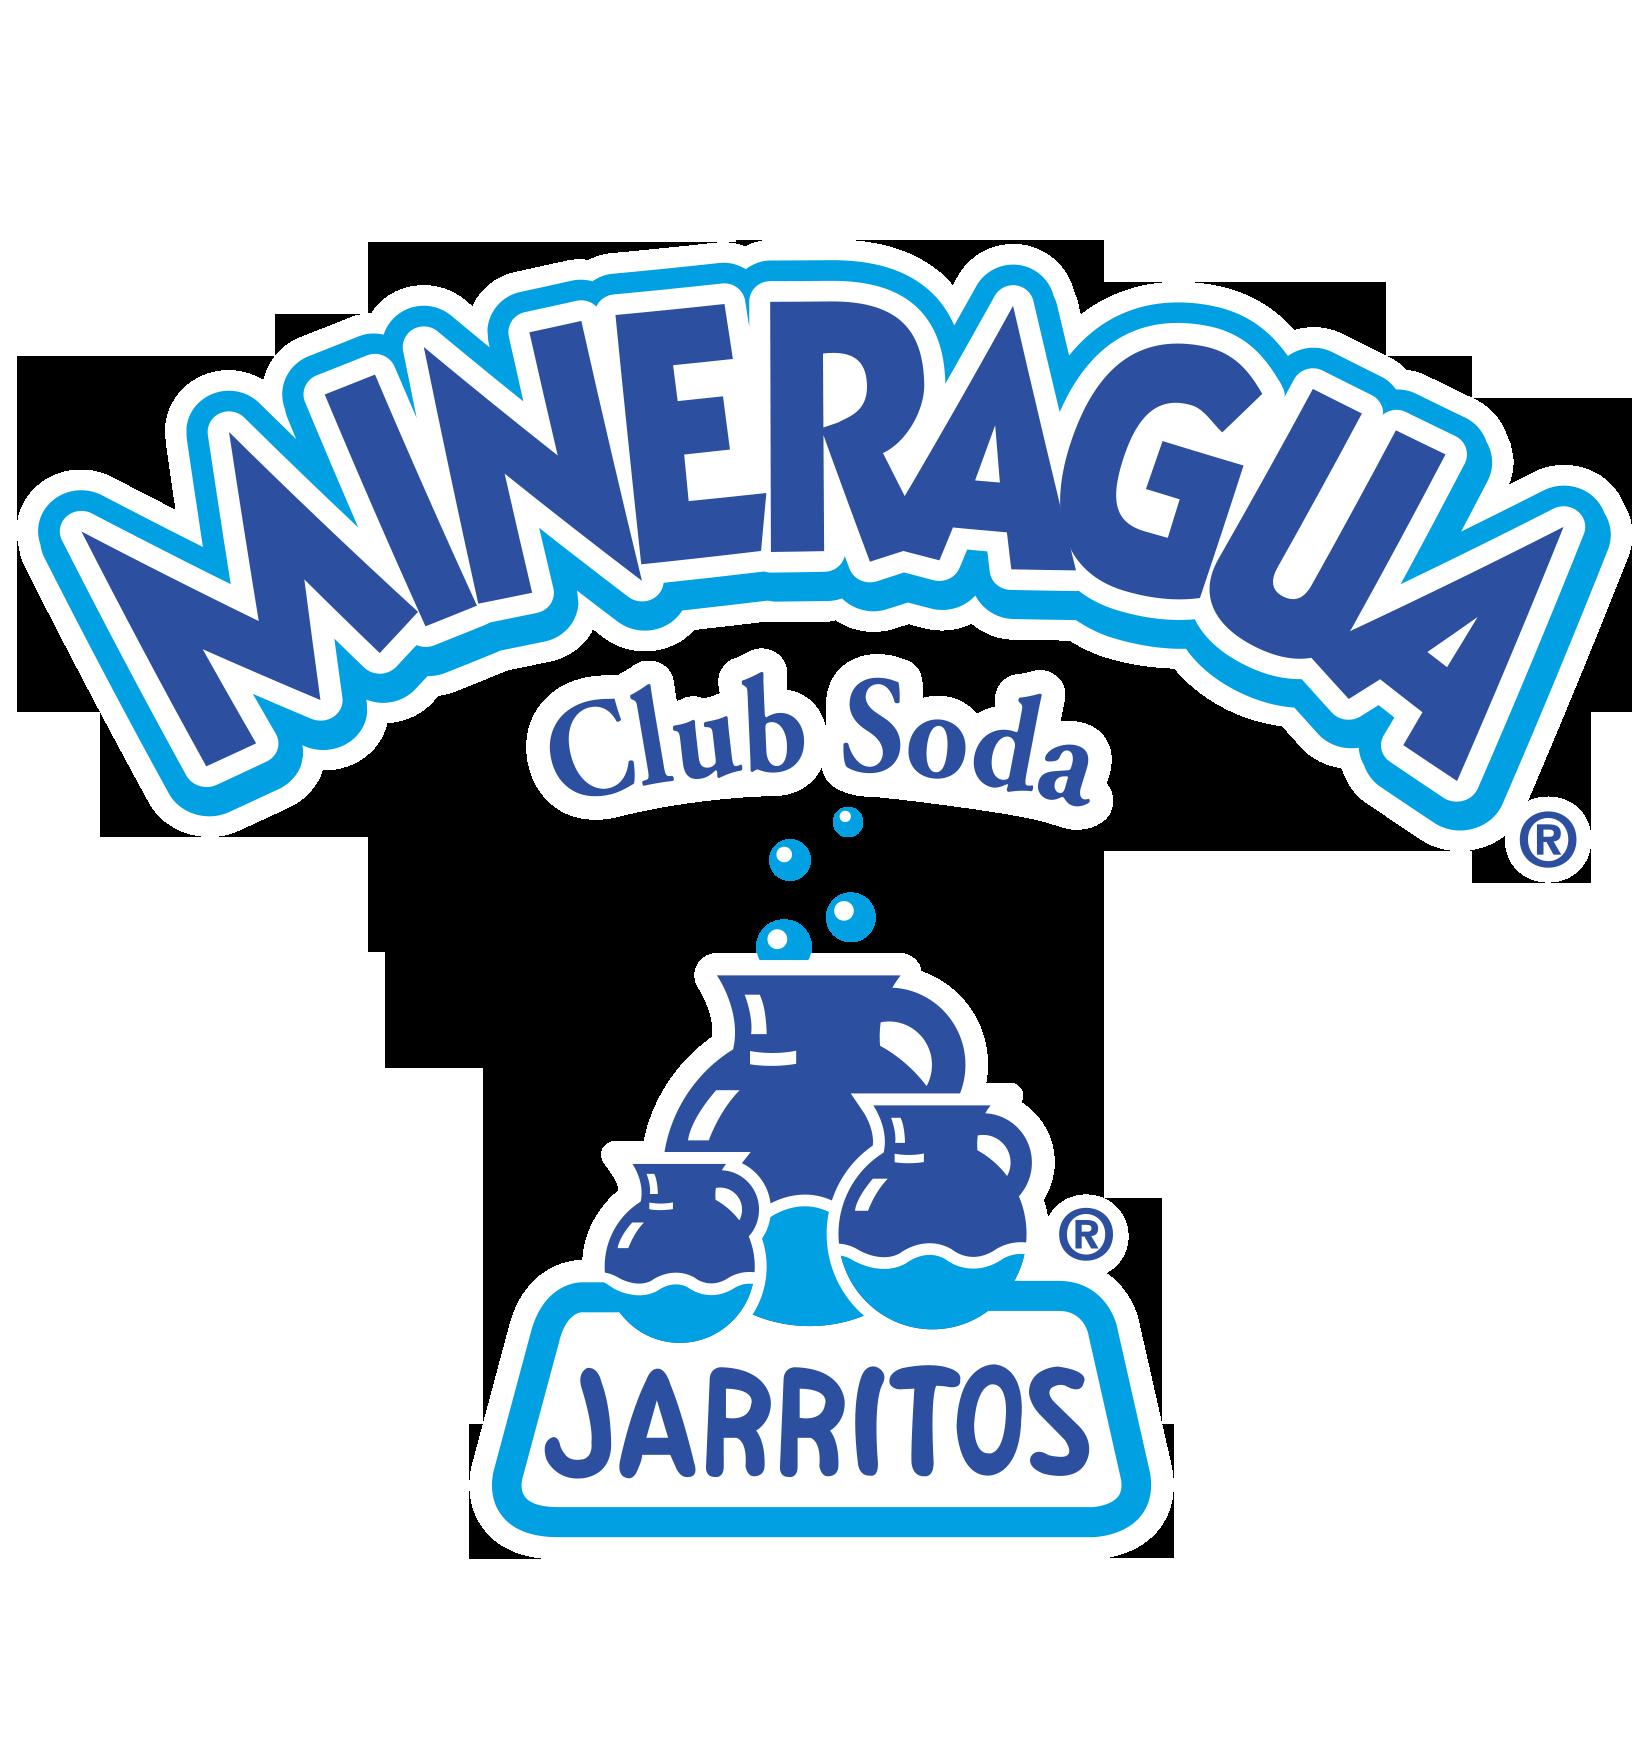 Mineragua Club Soda